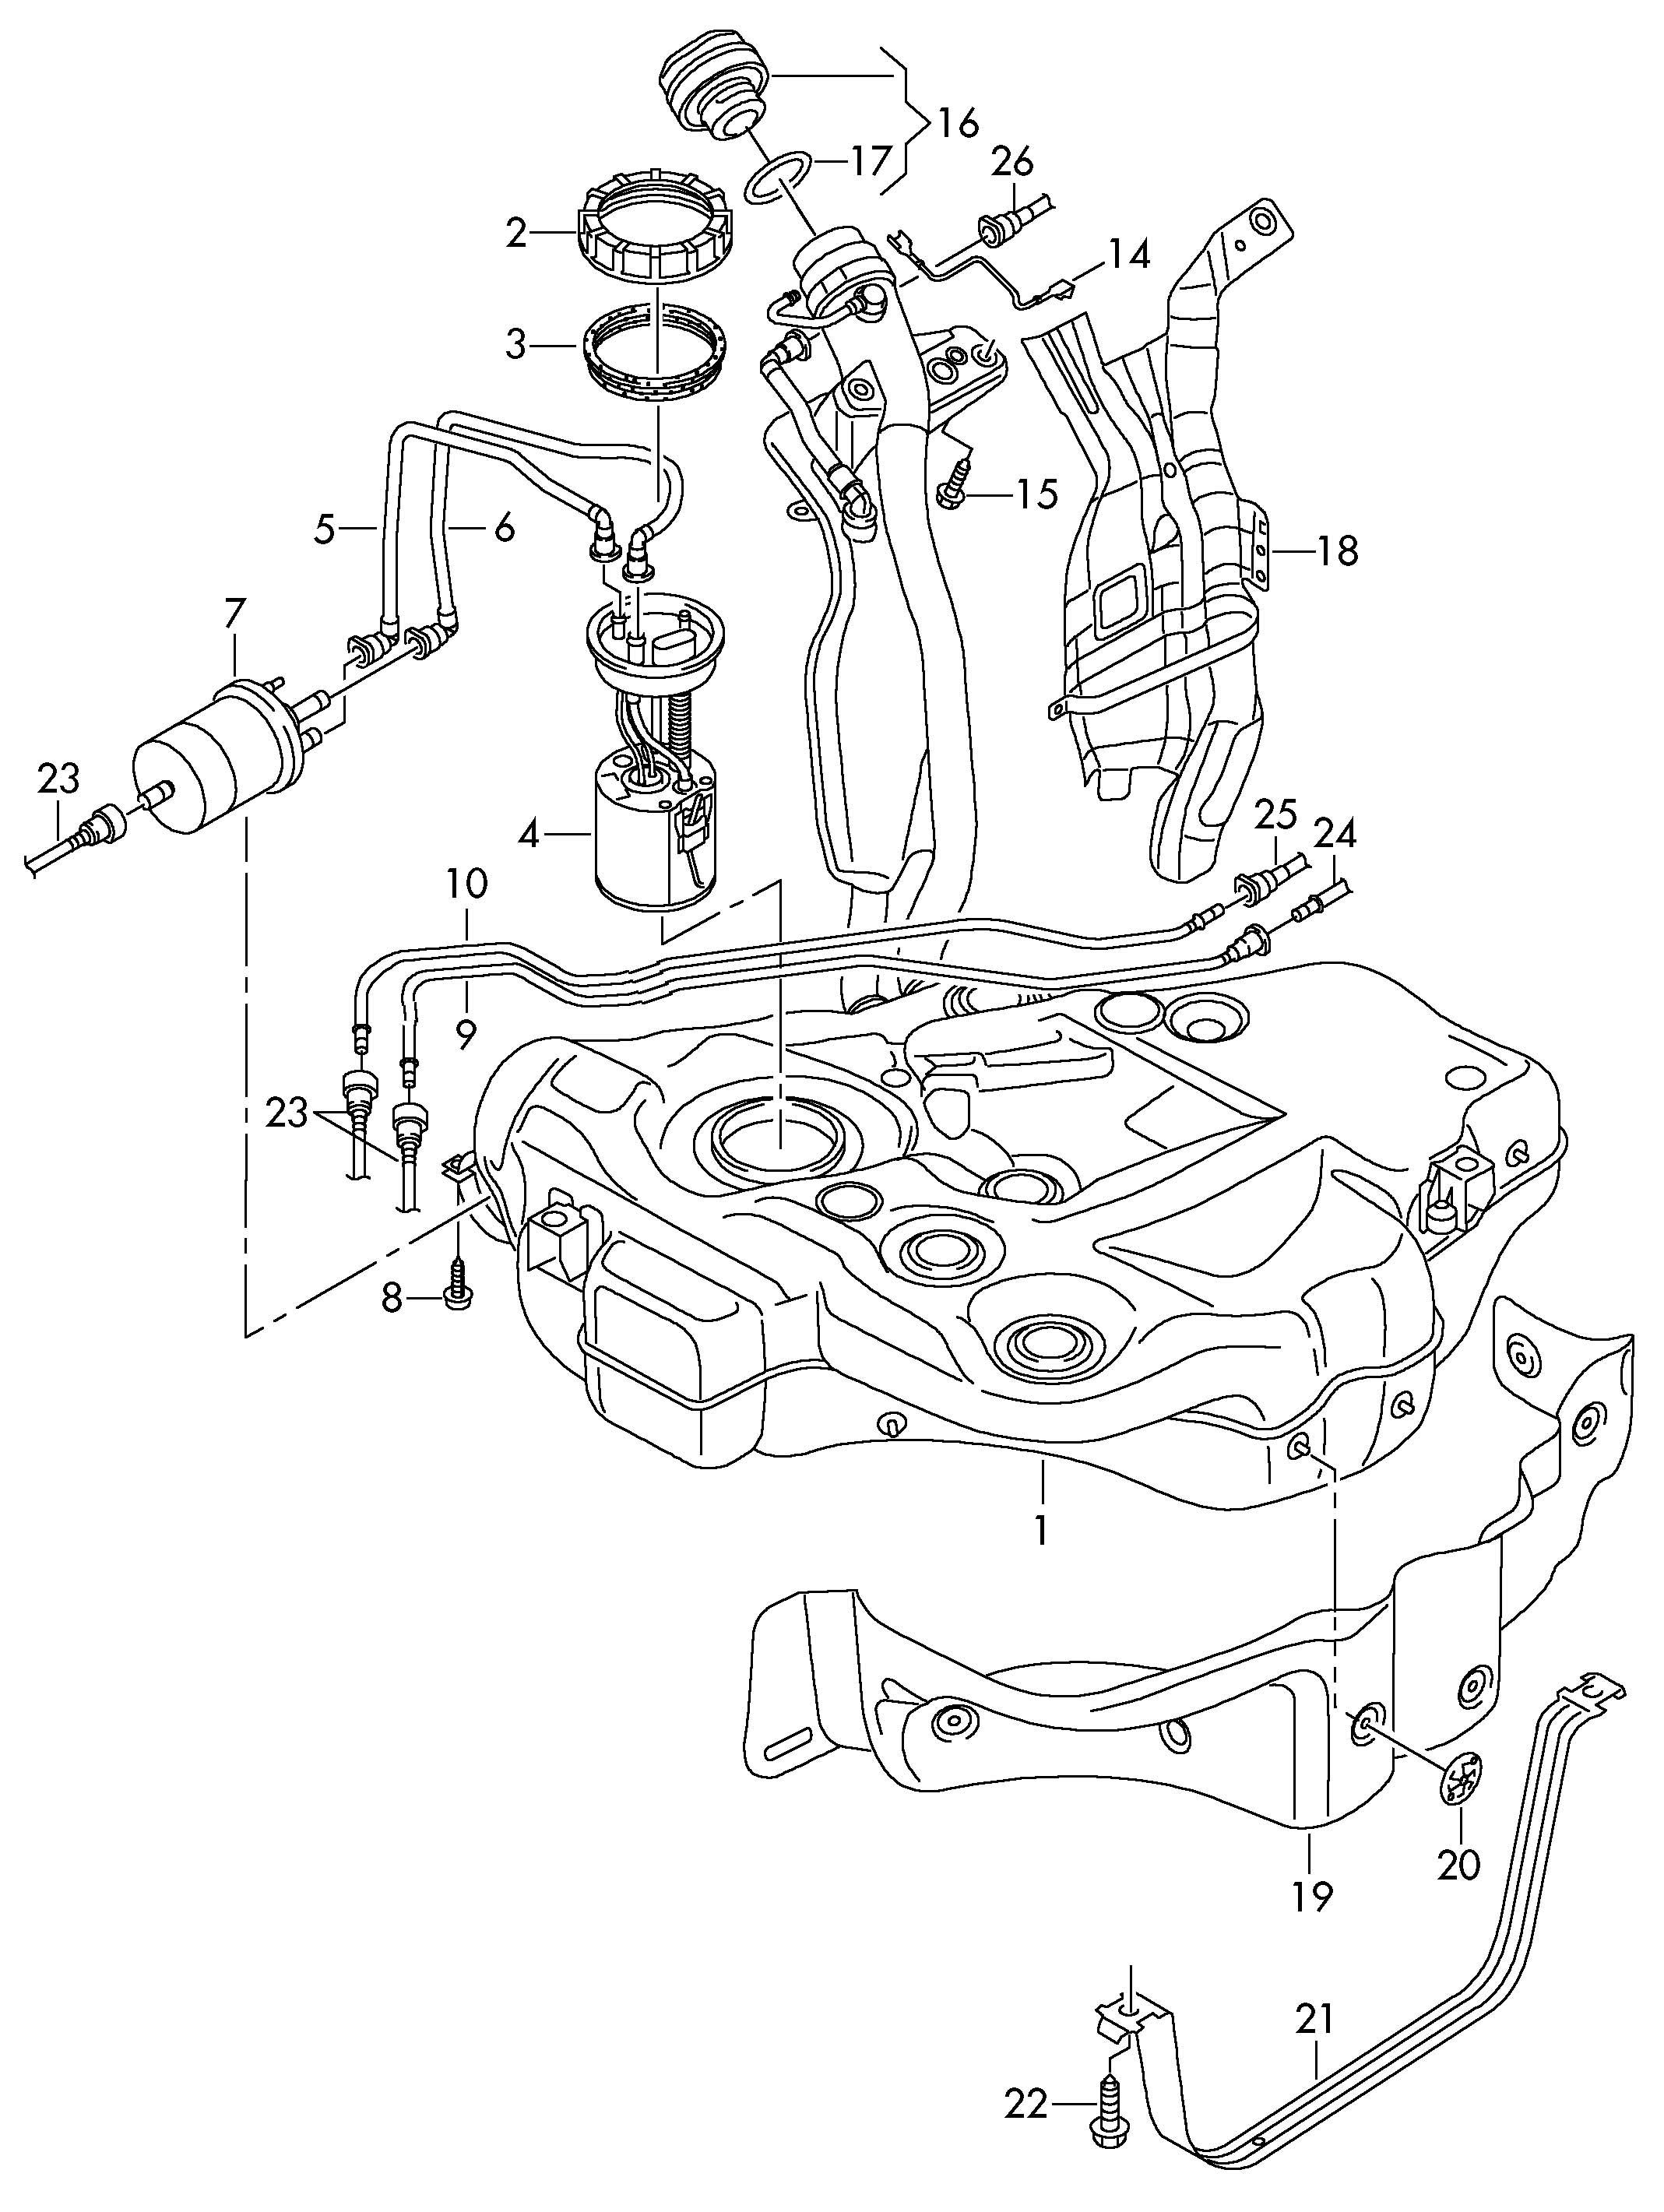 1976 cadillac eldorado wiring diagram ac besides 1966 plymouth wiring diagram additionally mopar parts catalog wiring